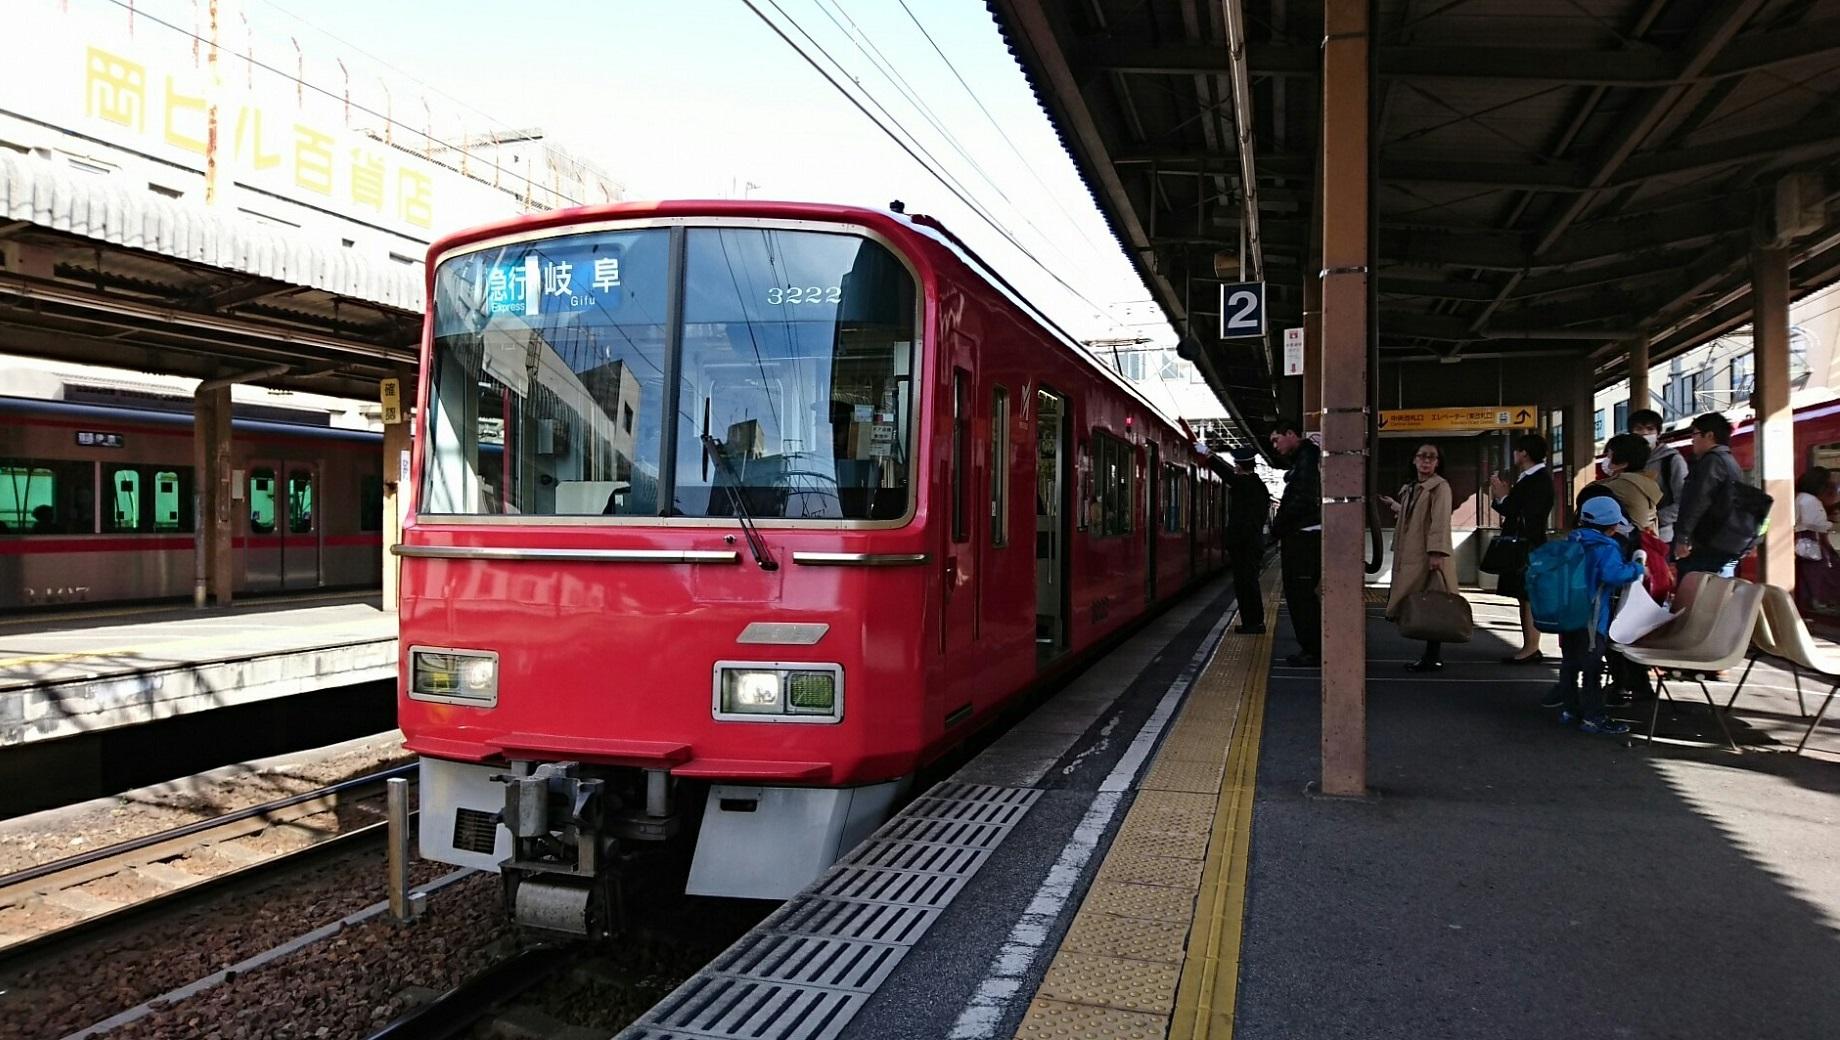 2018.3.23 東海道線 (71) 東岡崎 - 岐阜いき急行 1840-1040